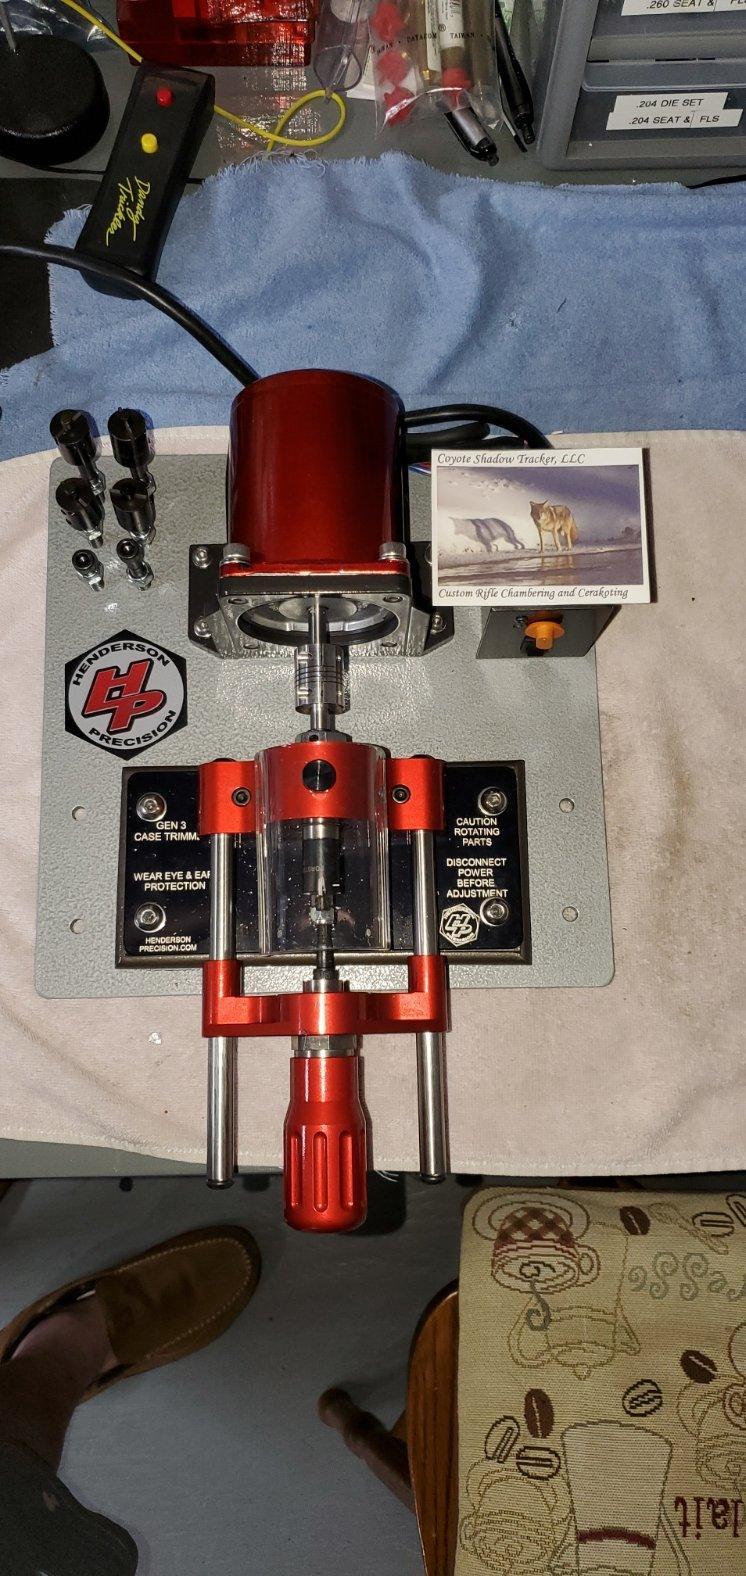 henderson-trimmer-modified-jpg.298972